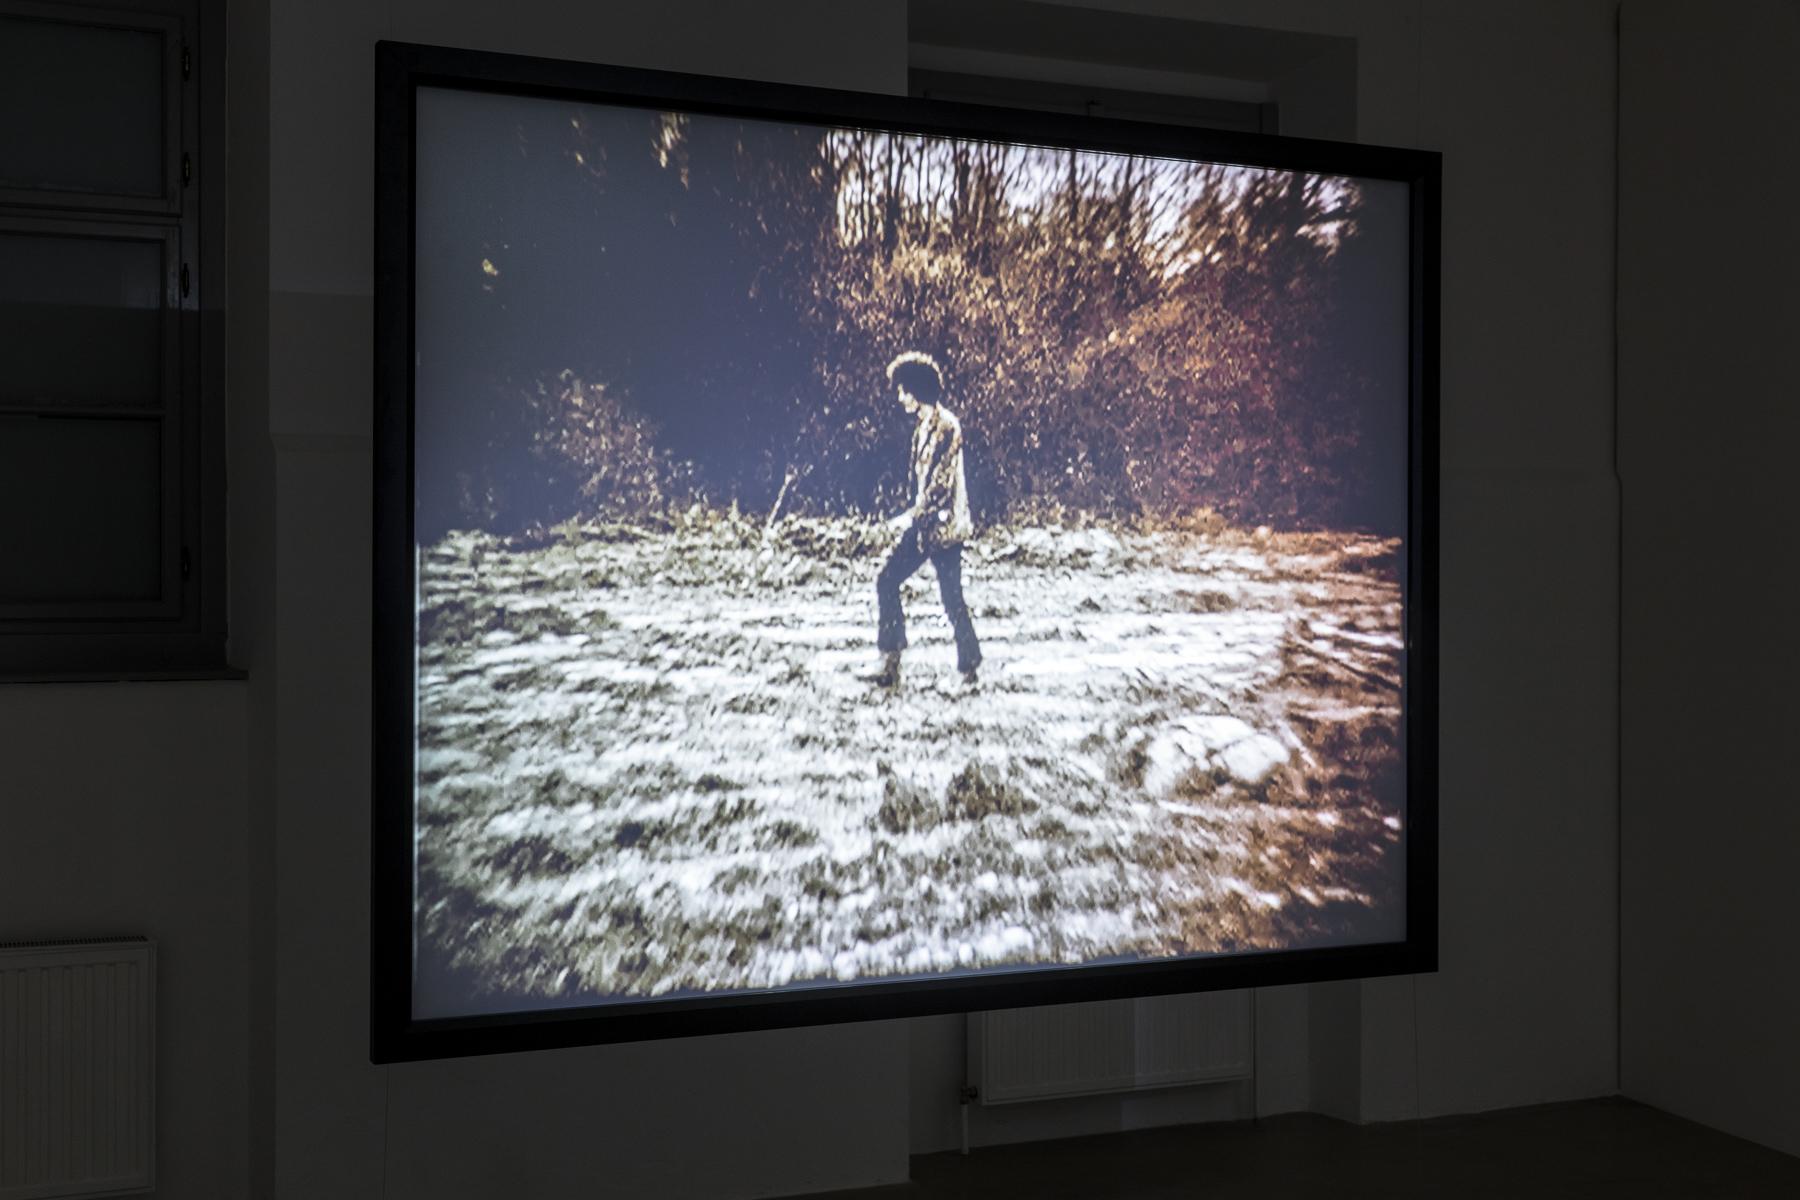 2019_03_11_Grazer Kunstverein_062_web.jpg